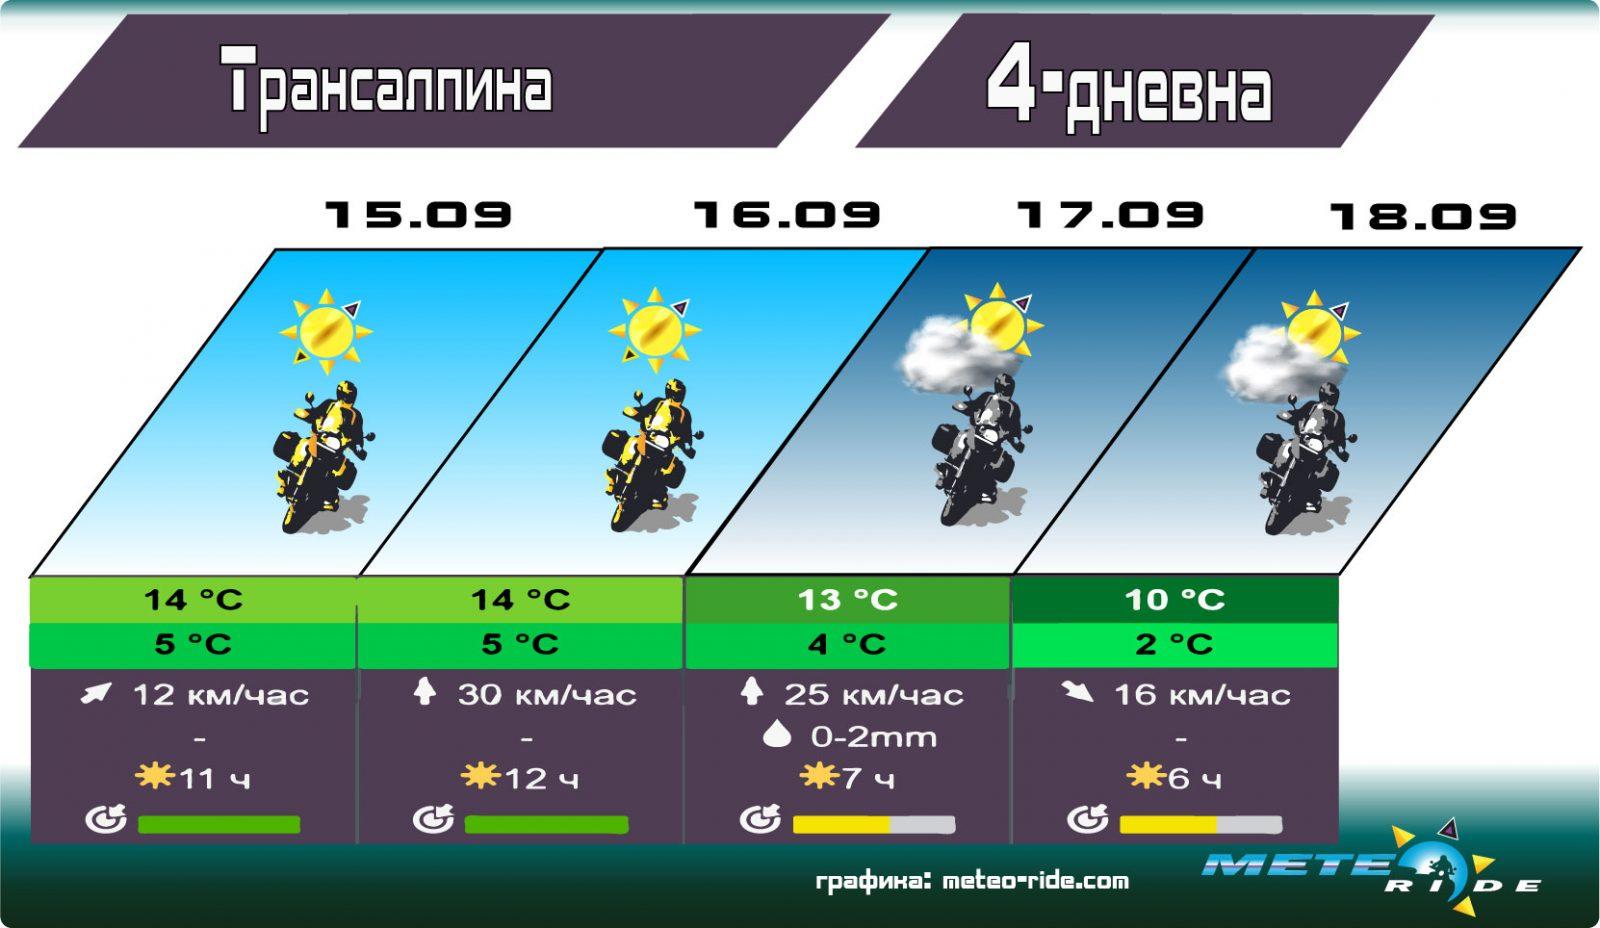 Слънчево и топло над 2000 м. в Карпатите този уикенд. Последен шанс за Трансалпина и Трансфъгърашан